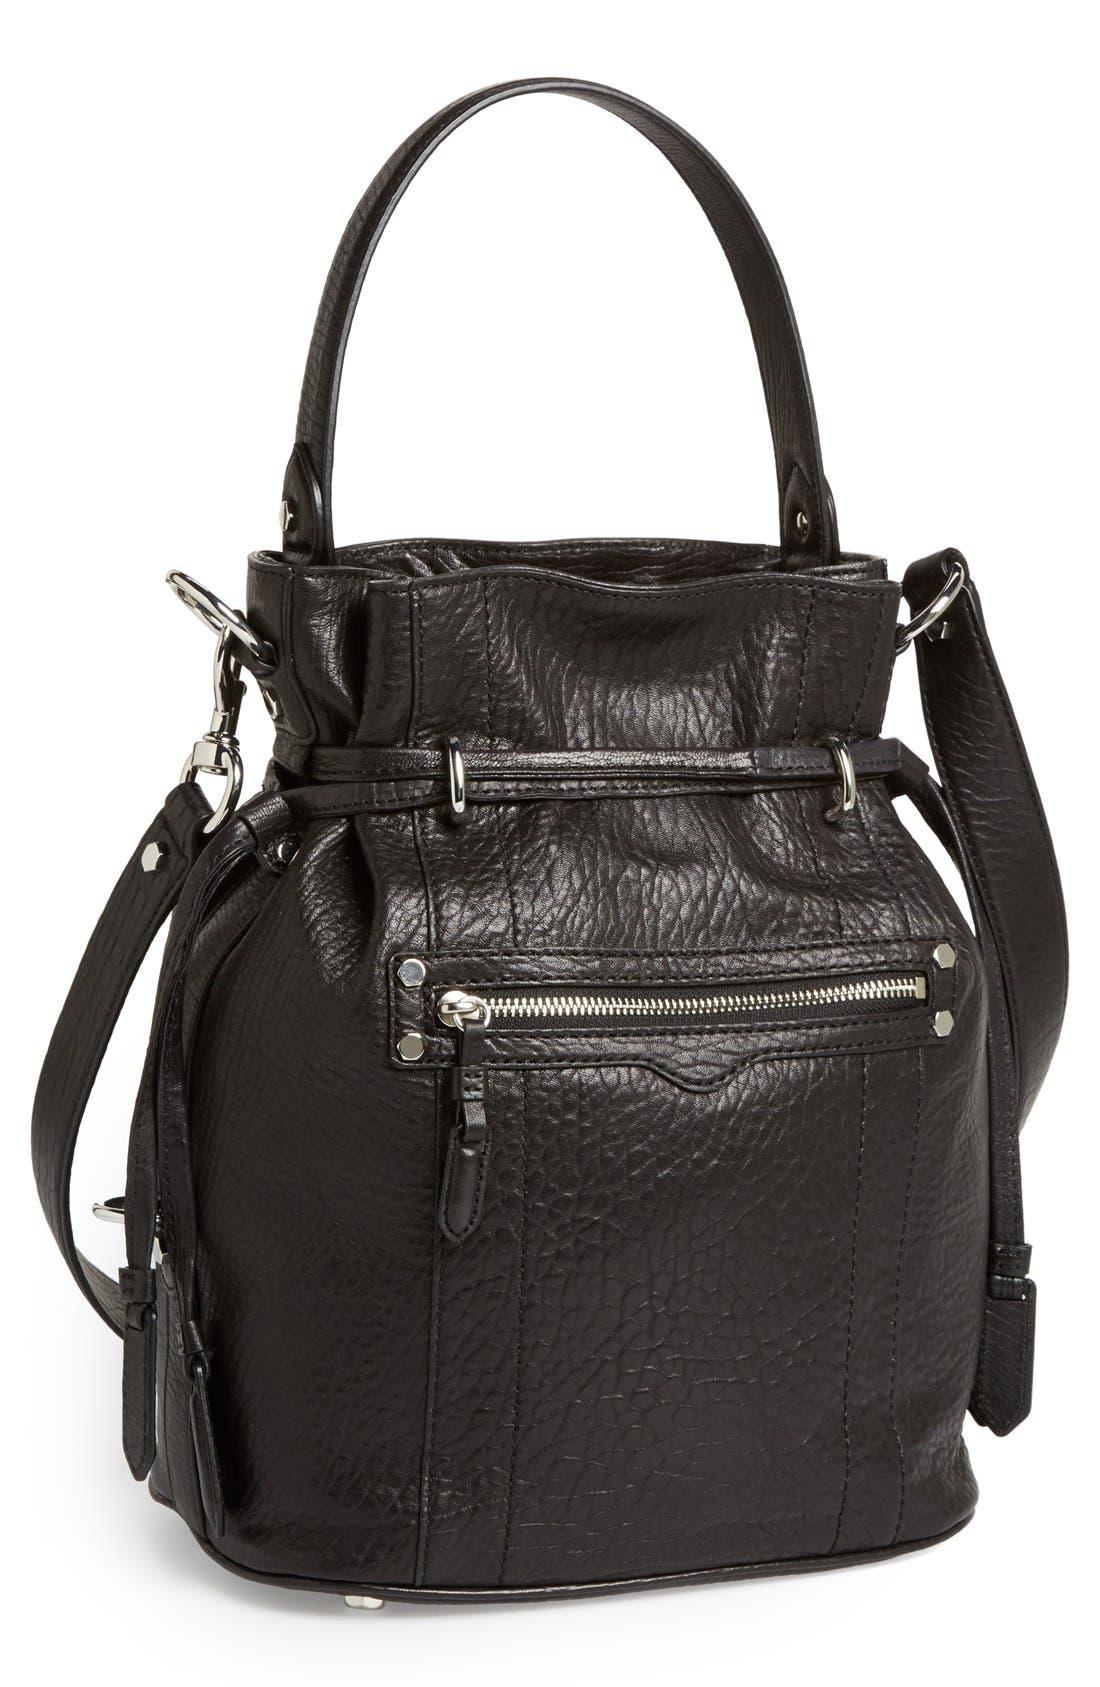 Alternate Image 1 Selected - Rebecca Minkoff 'Harley' Bucket Bag